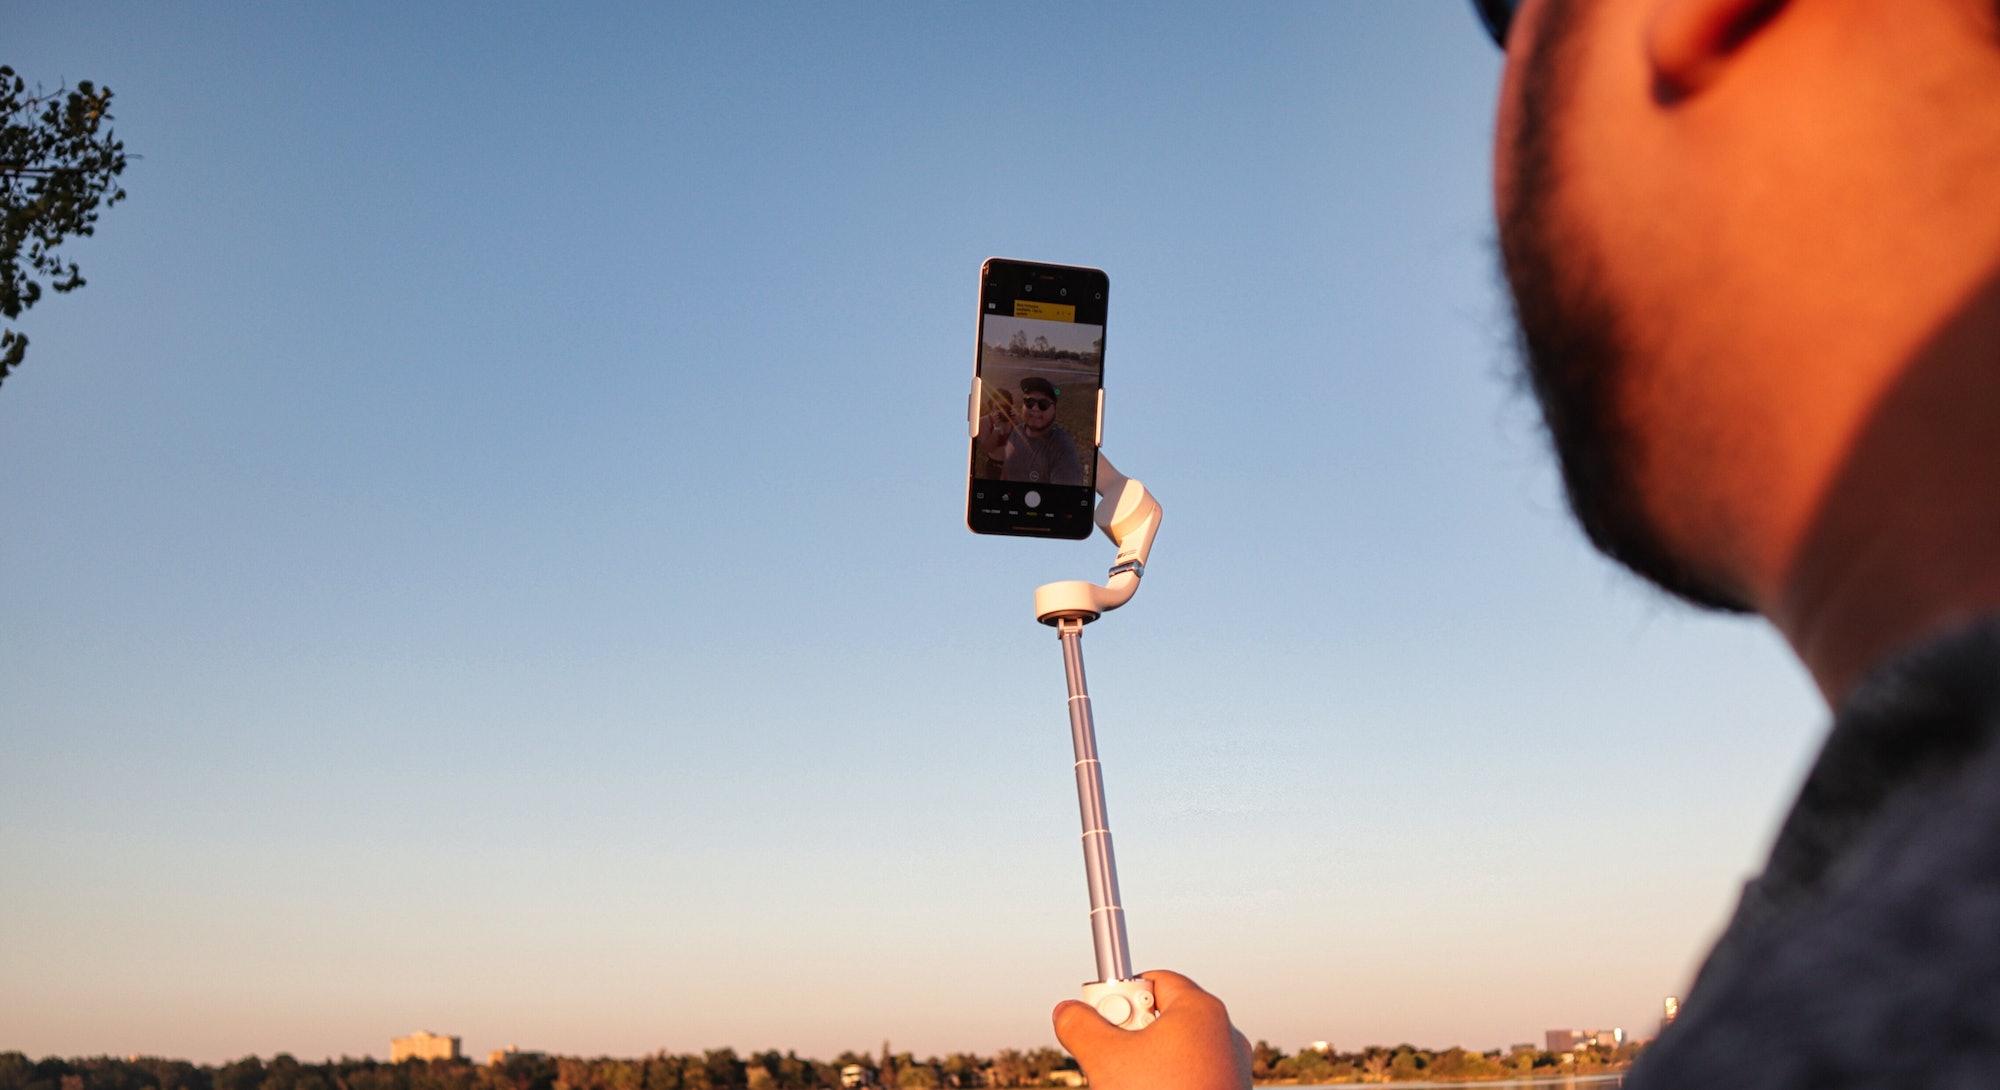 Selfie stick on Osmo Mobile 5